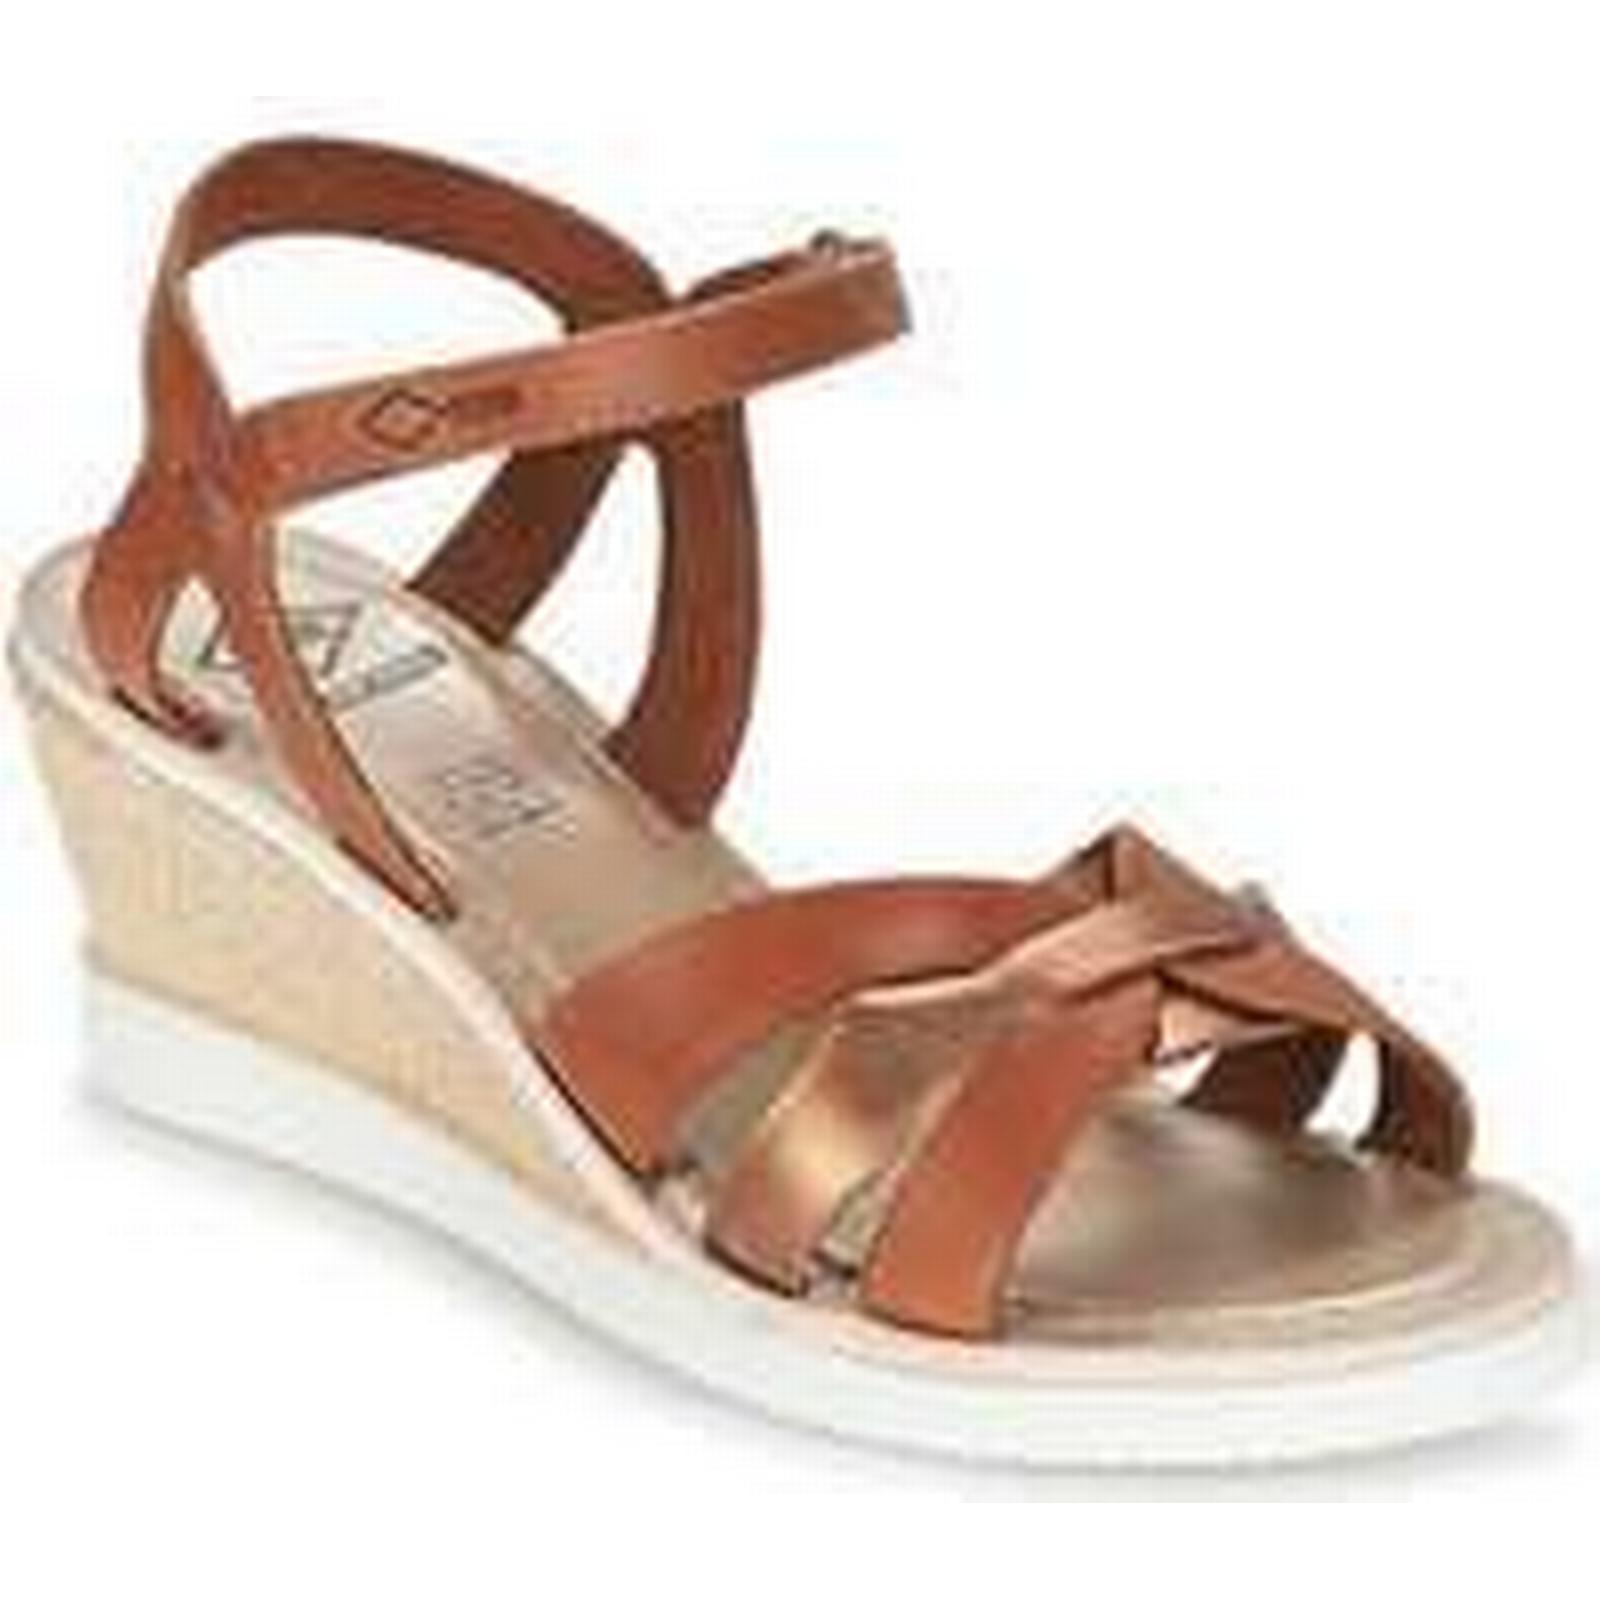 Spartoo.co.uk PLDM women's by Palladium PLUMEA CSB women's PLDM Sandals in Brown 15116b